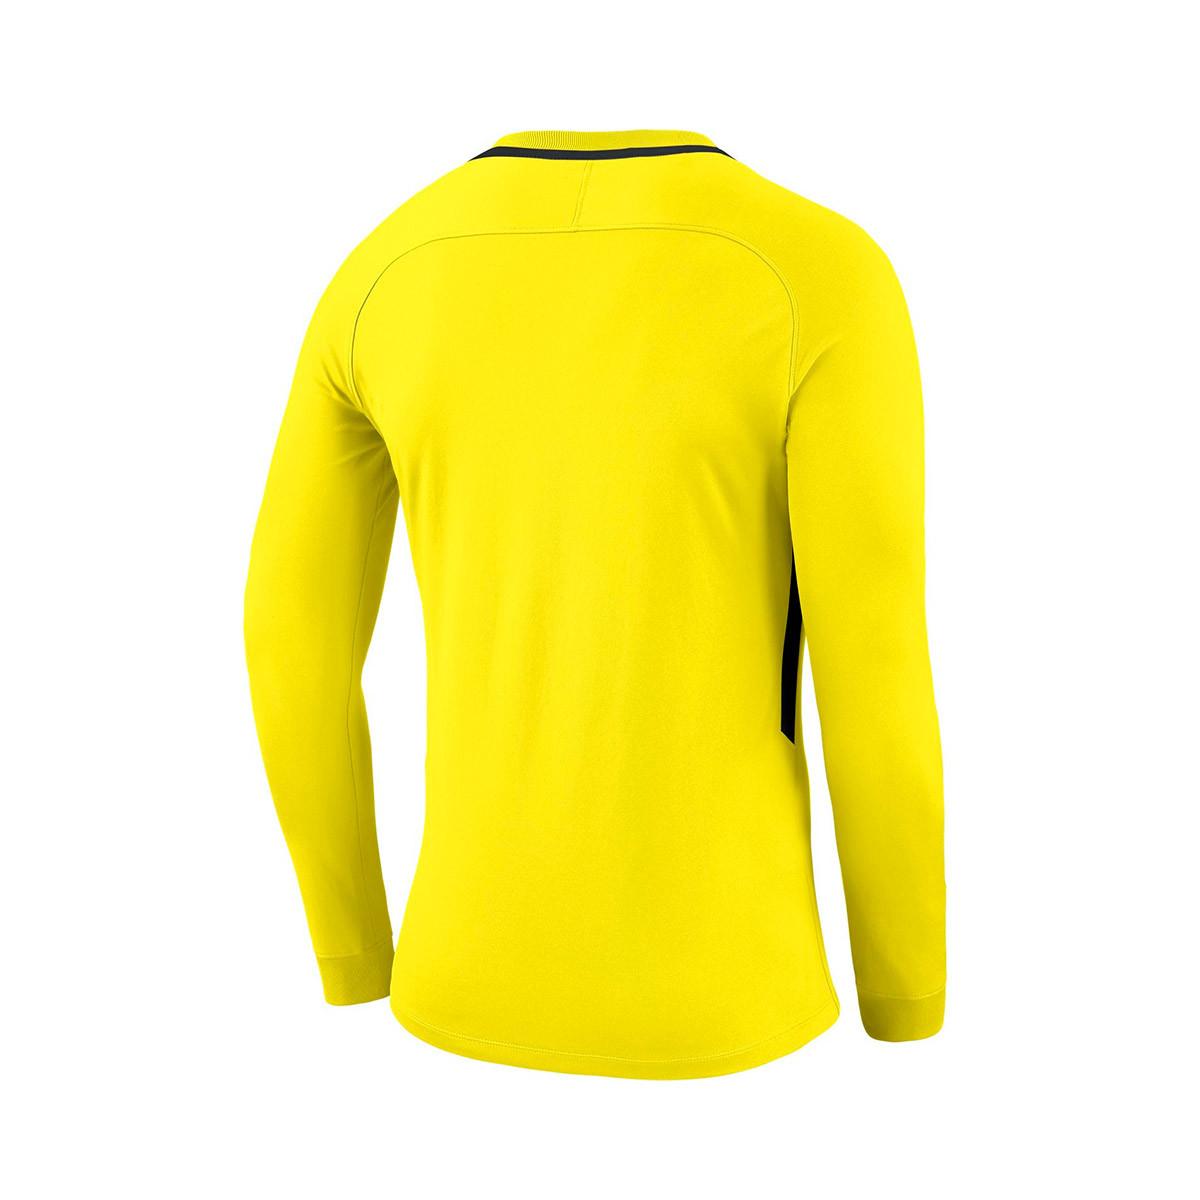 cba67e9de49 Jersey Nike Park Goalie III m l Opti yellow-Black - Tienda de fútbol Fútbol  Emotion